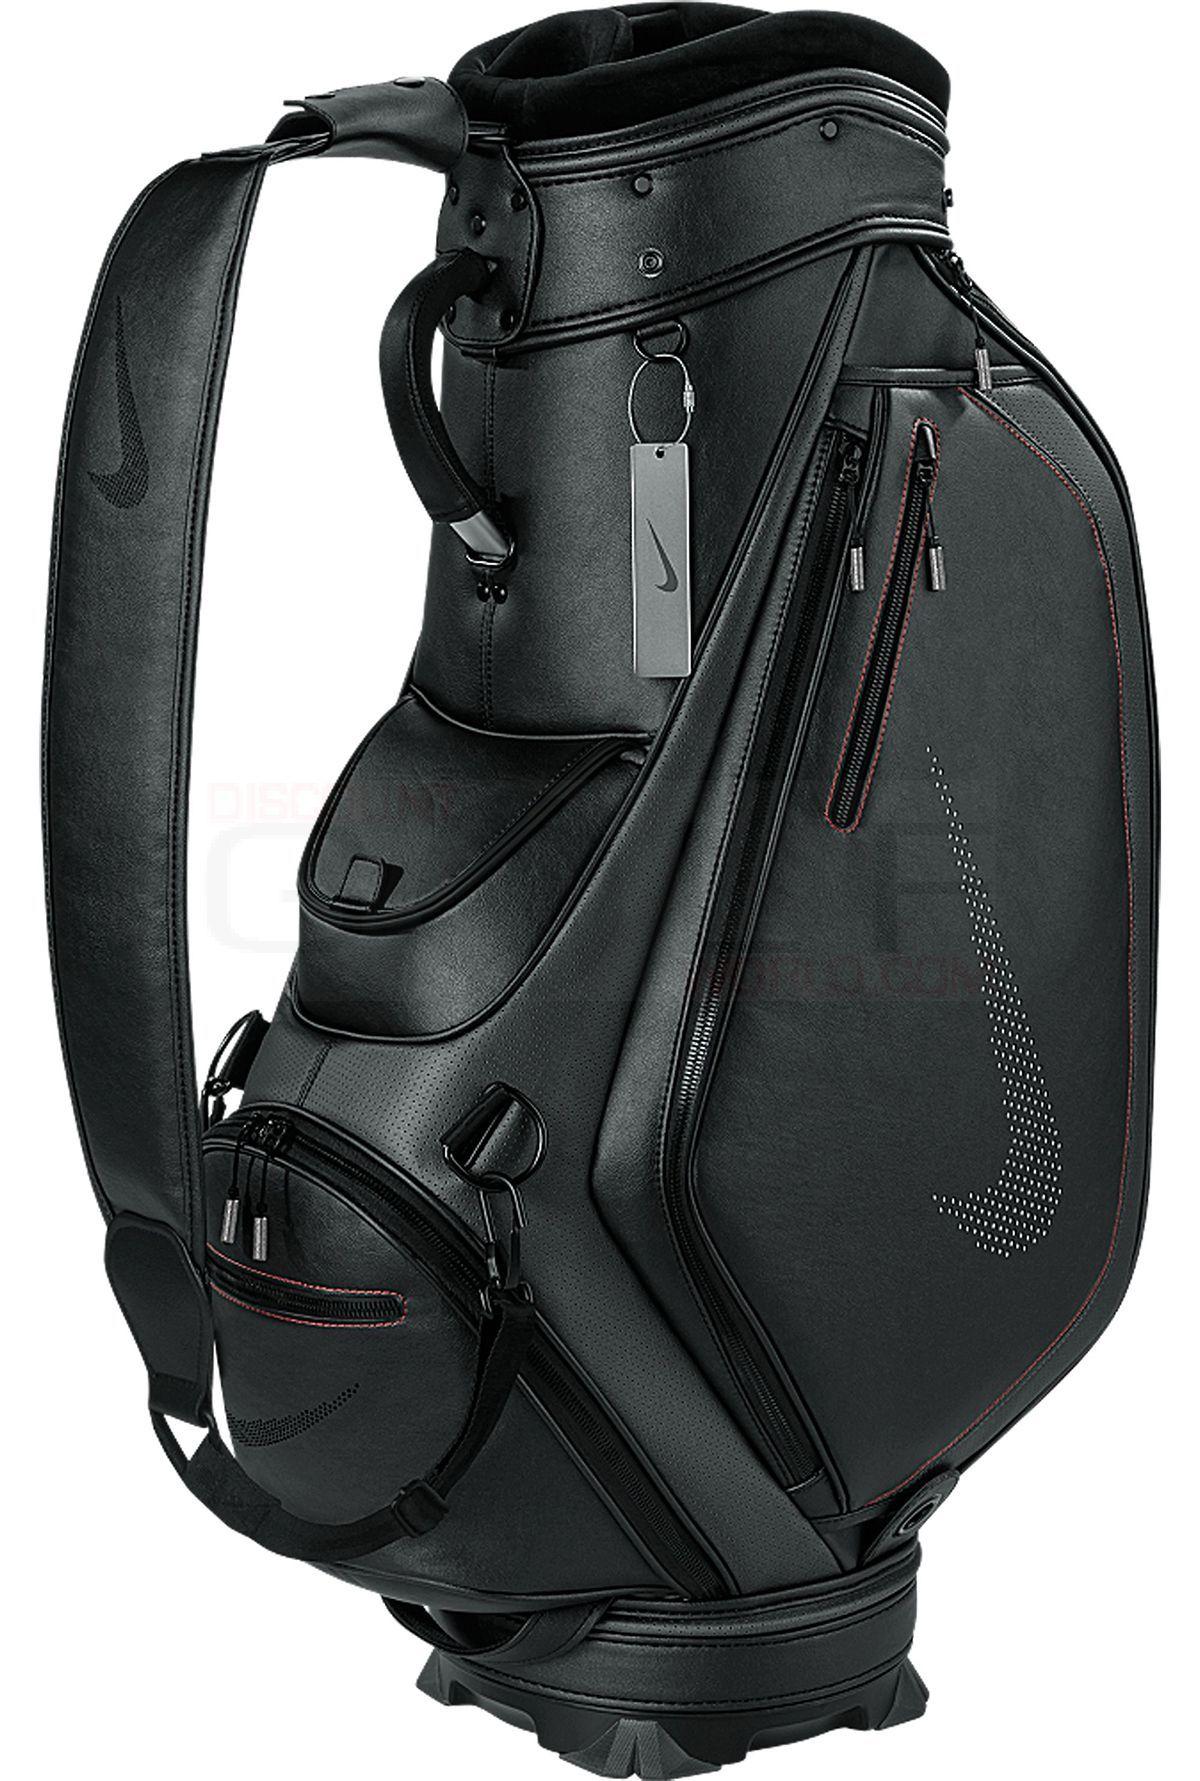 bef8107dbf Nike Platinum Modern Cart Bag BG0394 Lightweight, 6-Way, Slip Resistant  Strap Mens